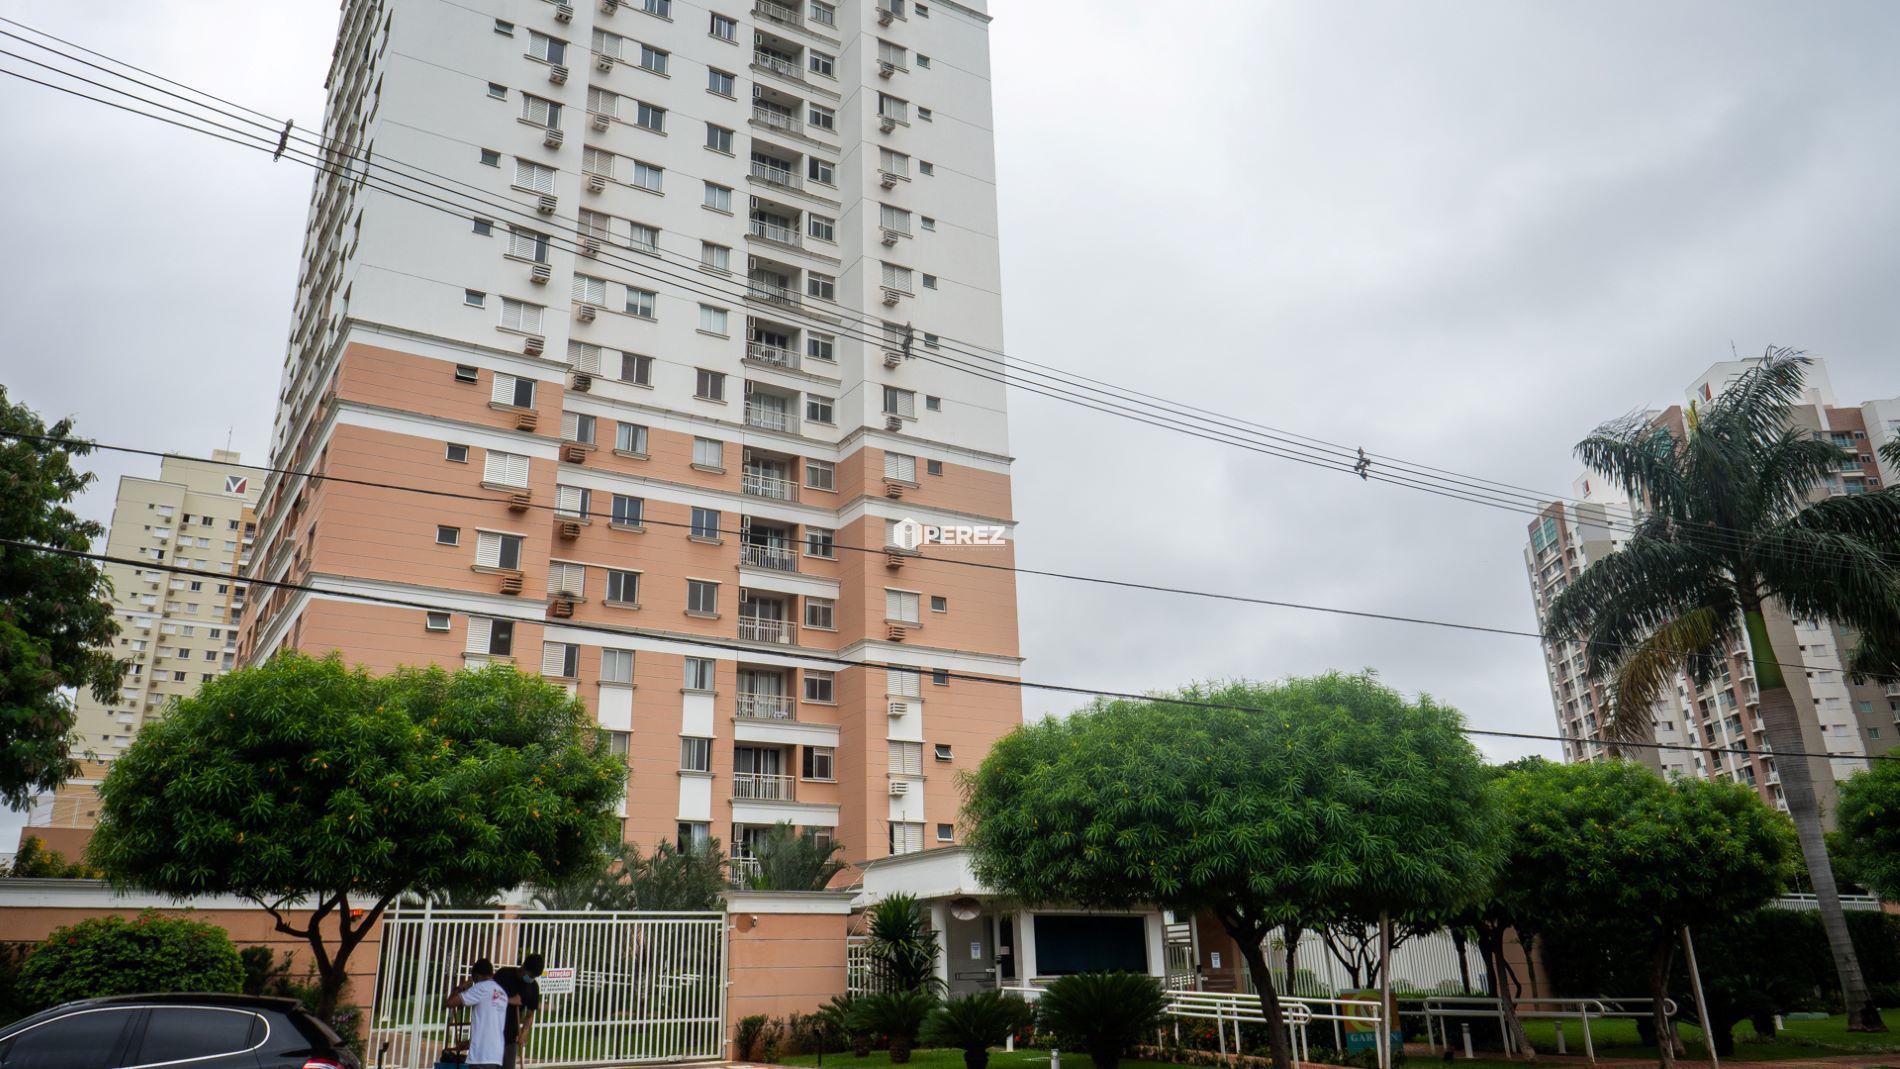 aluguel-campo-grande-ms-apartamento-ernesto-geisel-monte-castelo-perez-imoveis